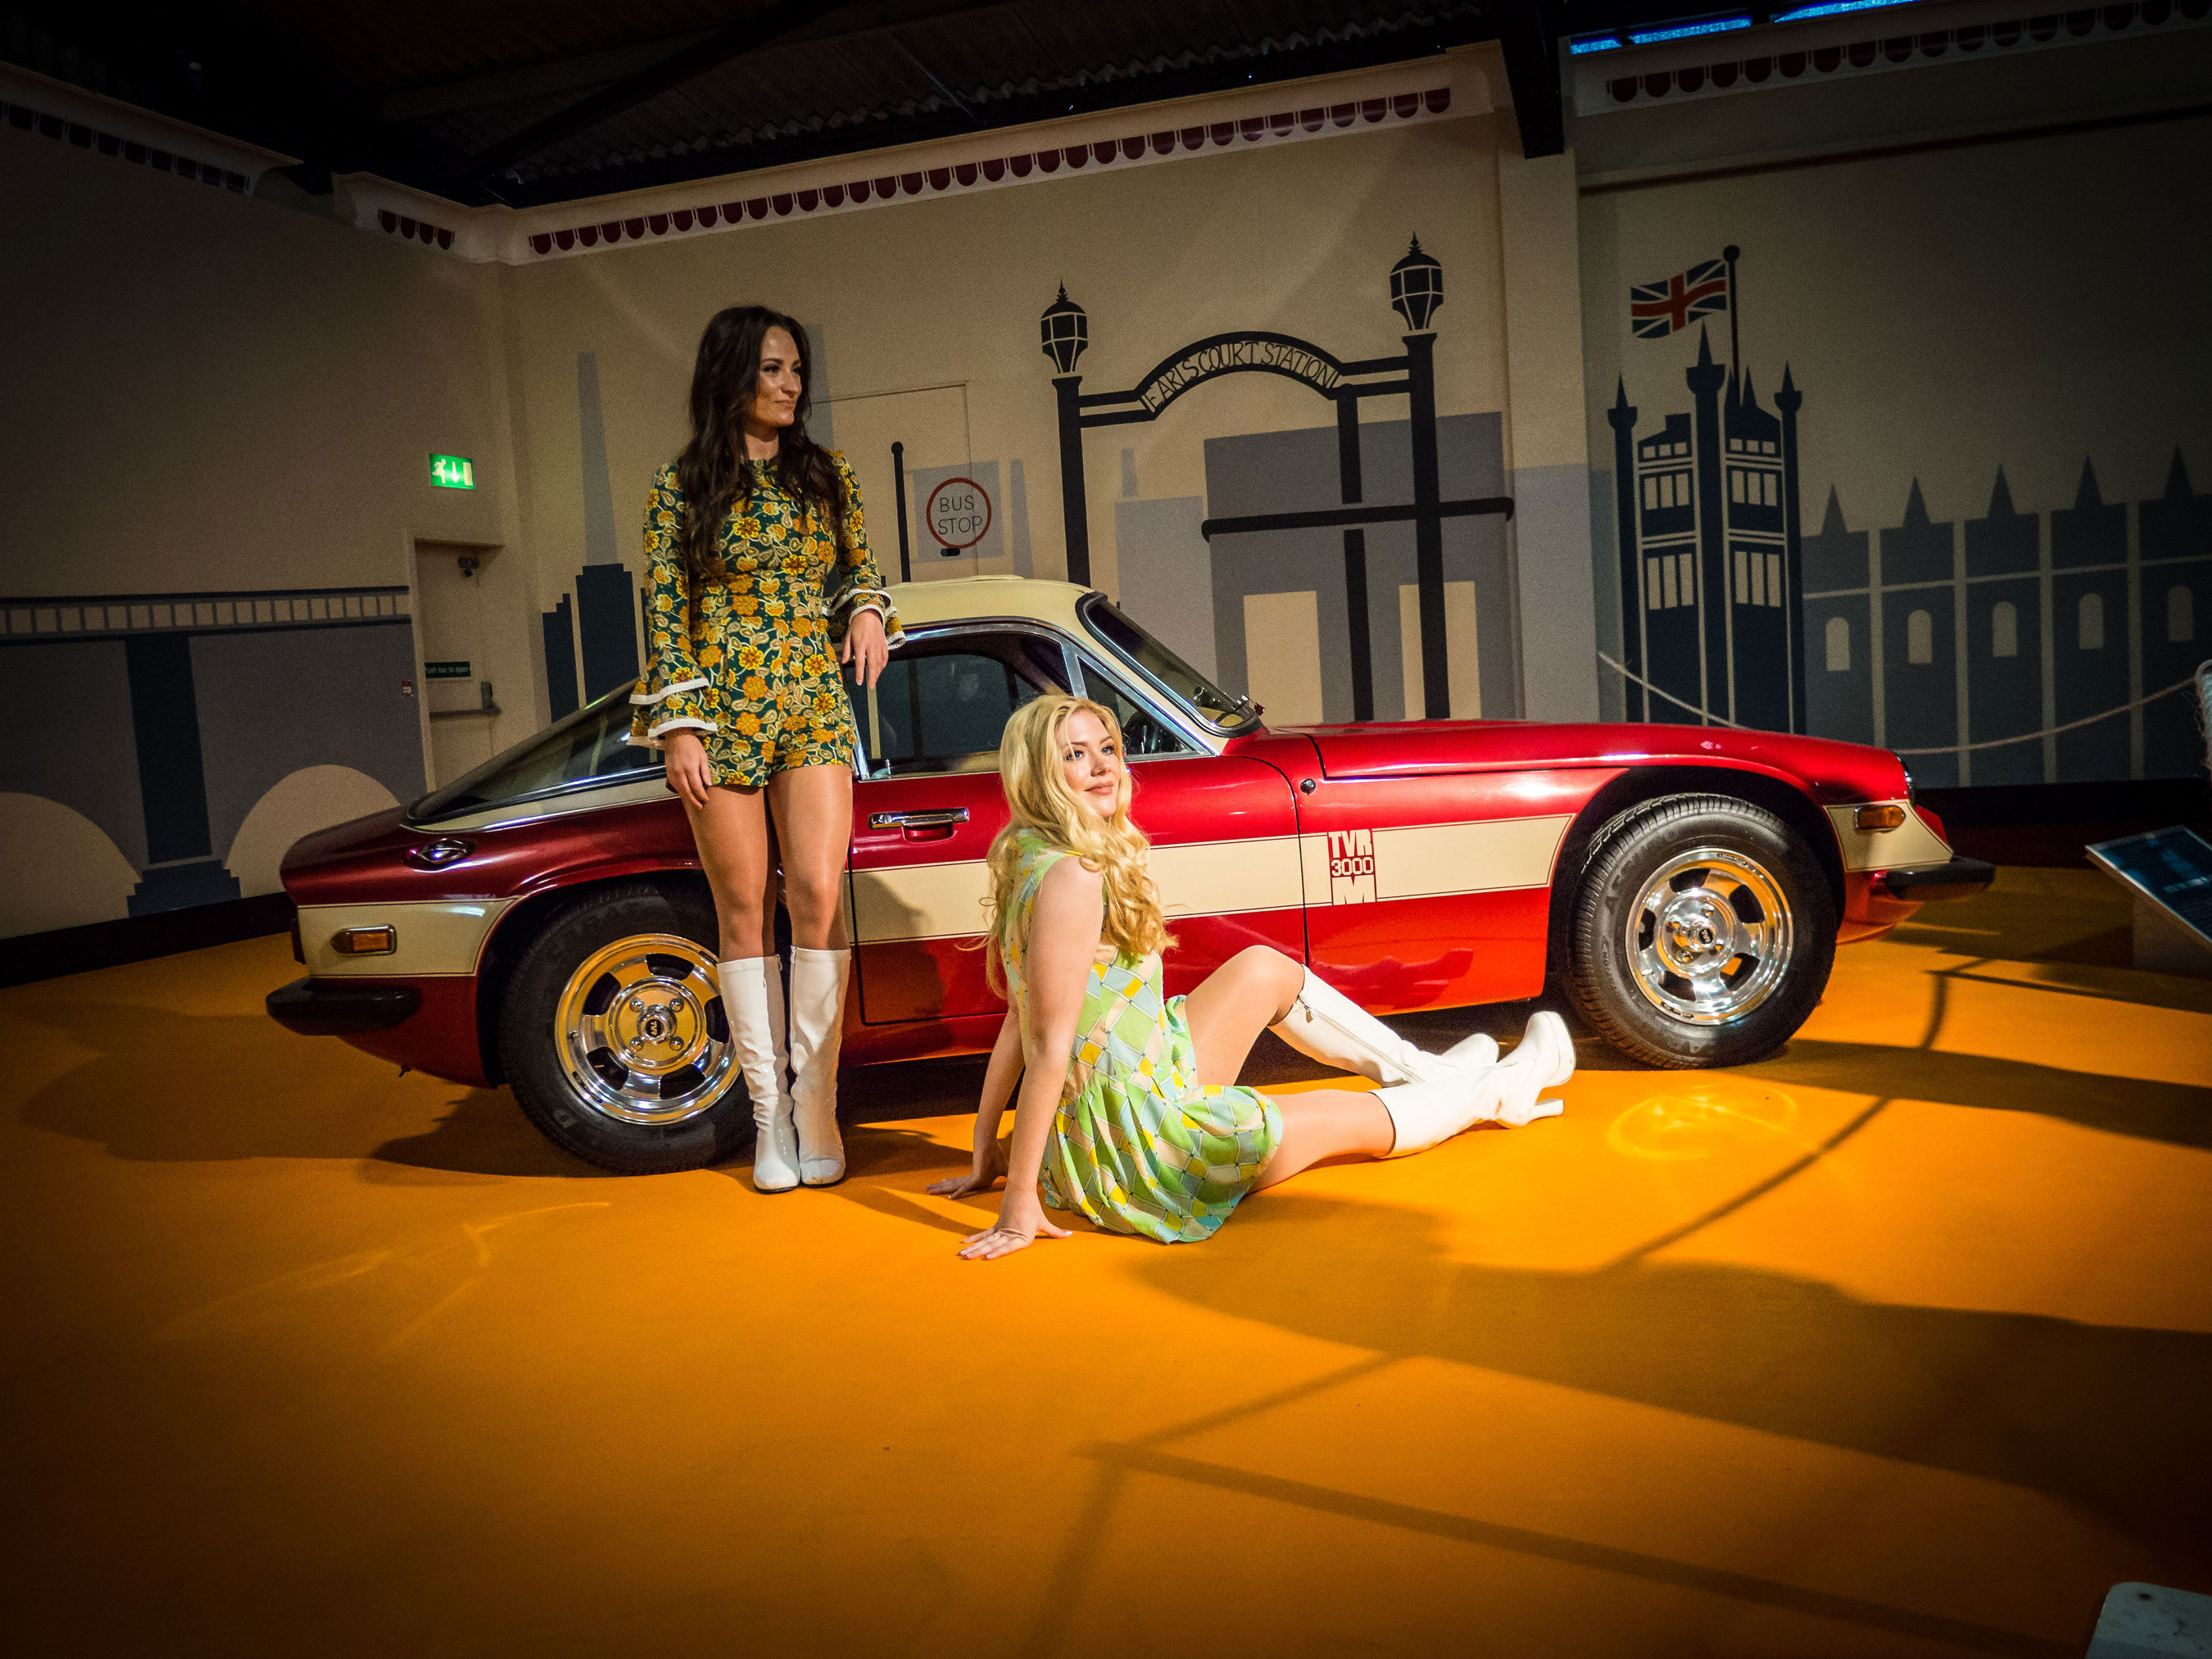 1978 TVR Tuscan 3000M